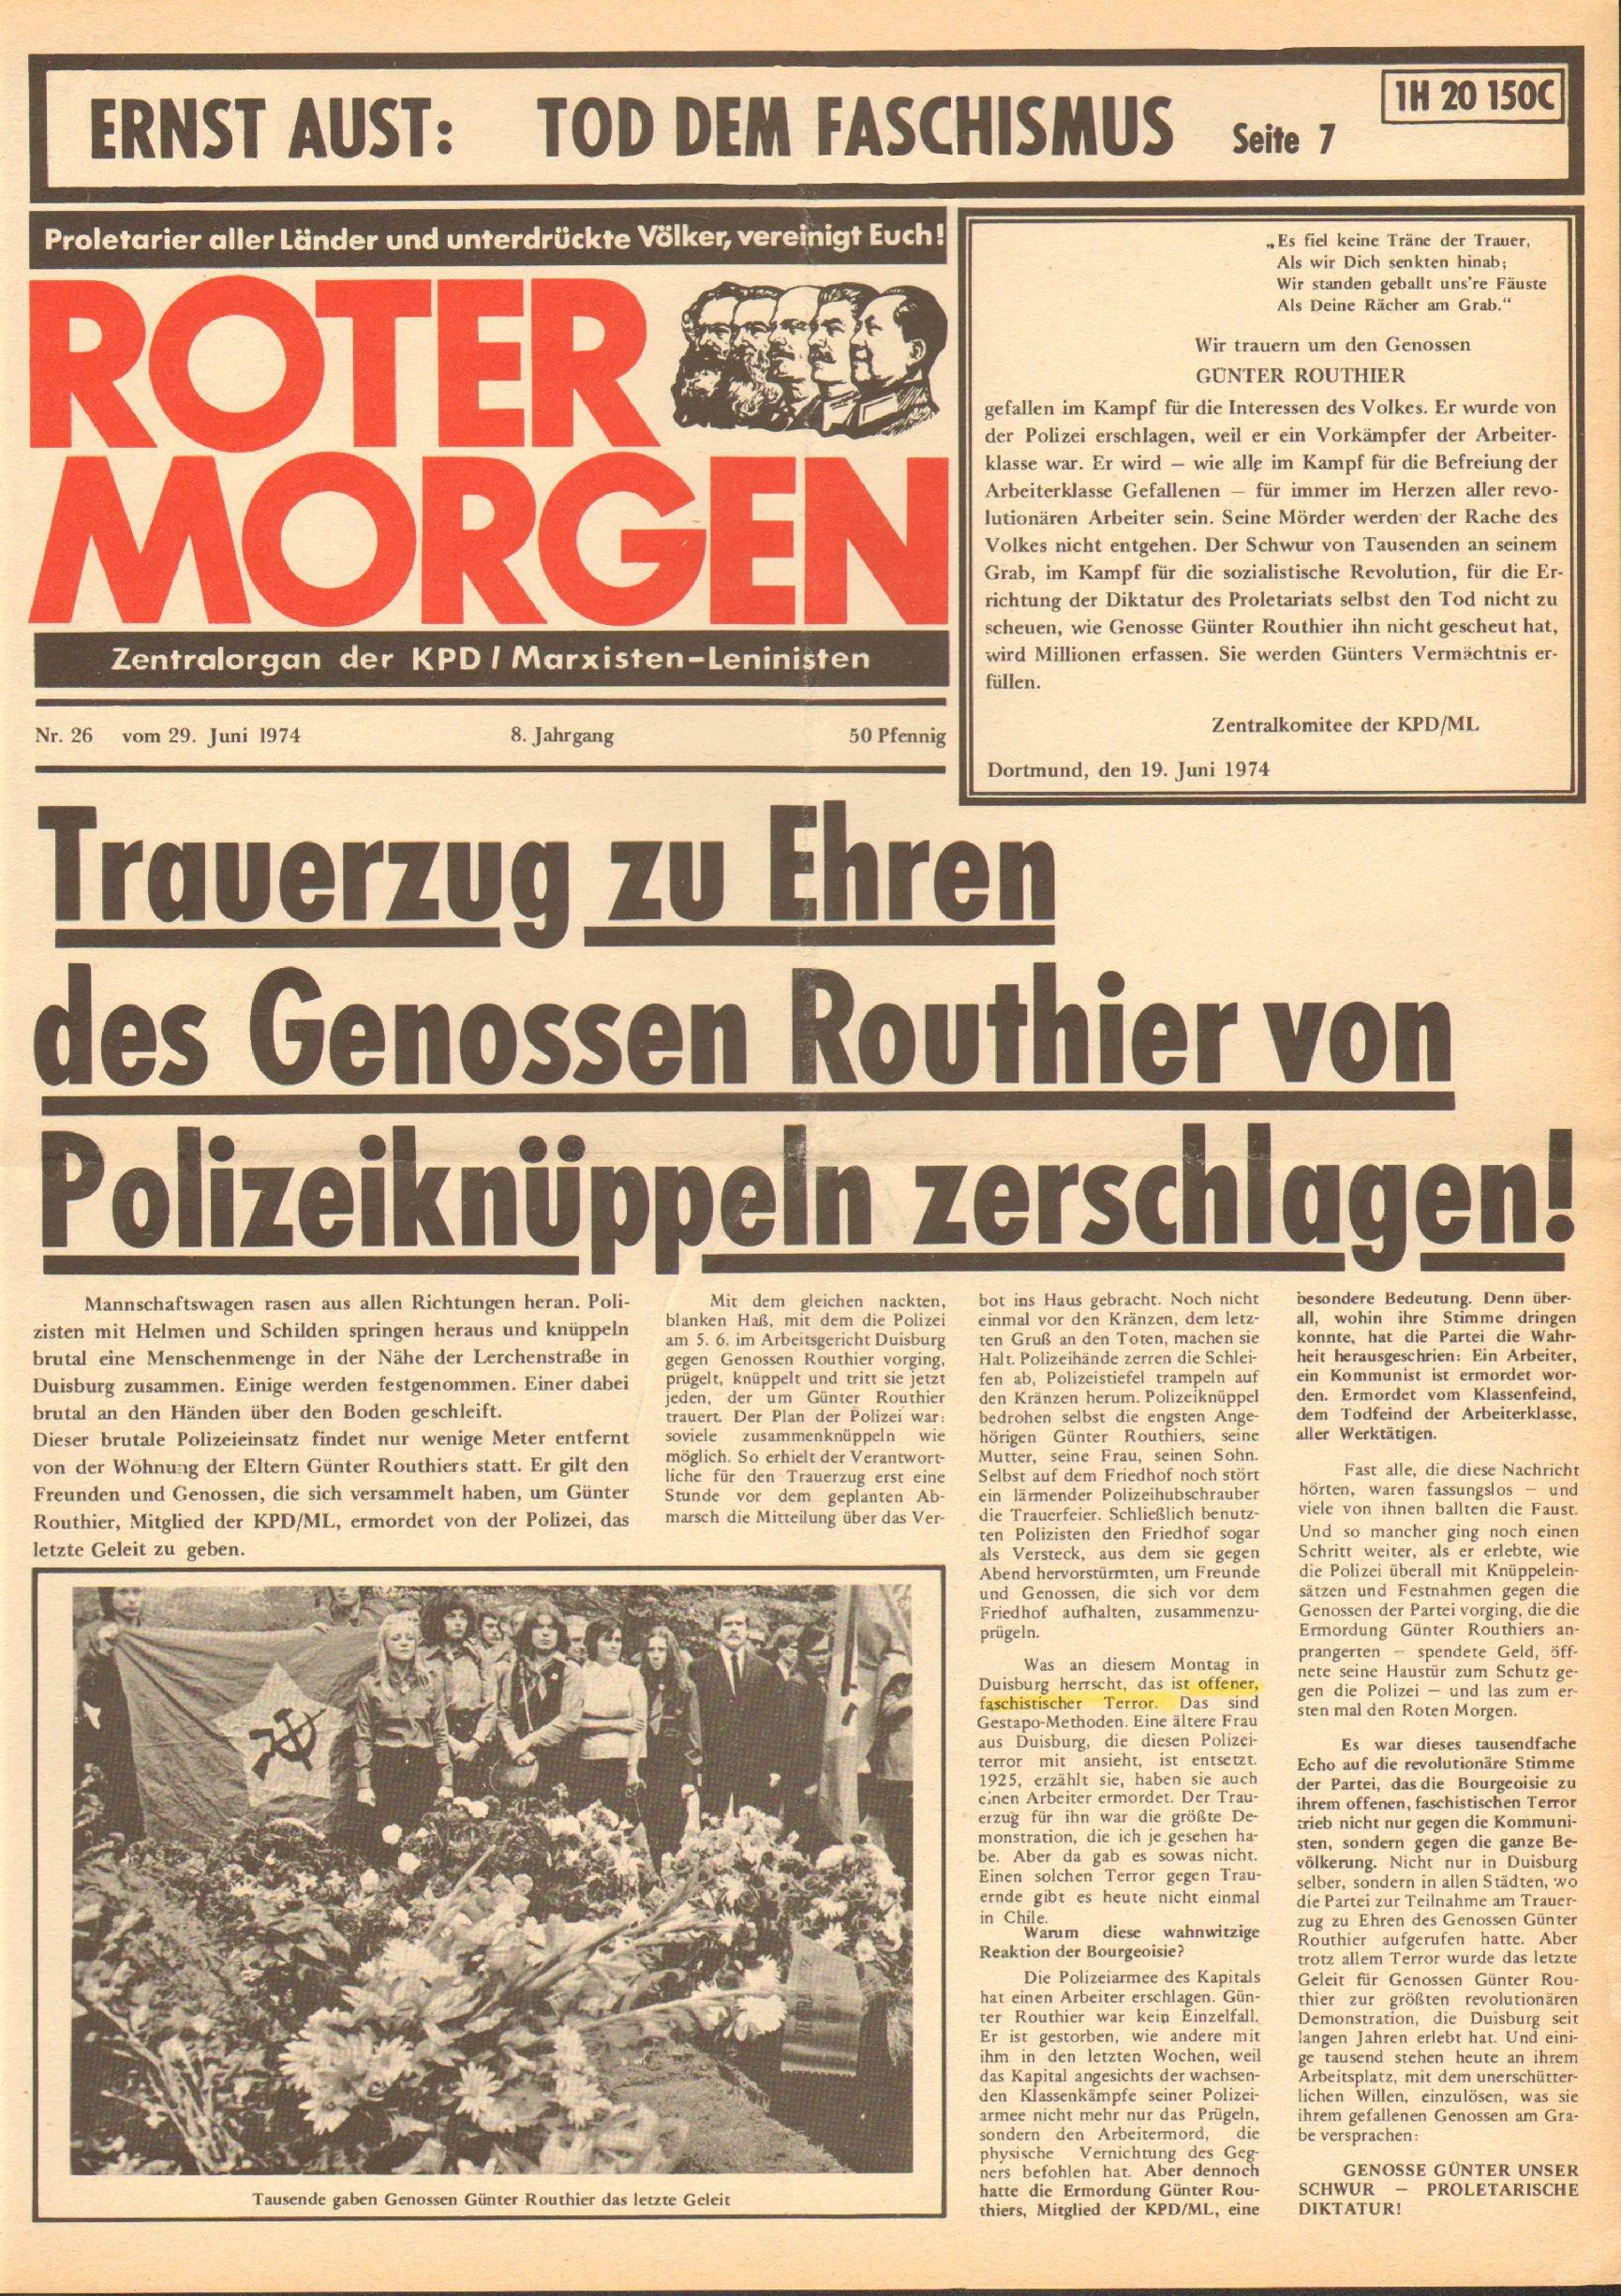 Roter Morgen, 8. Jg., 29. Juni 1974, Nr. 26, Seite 1